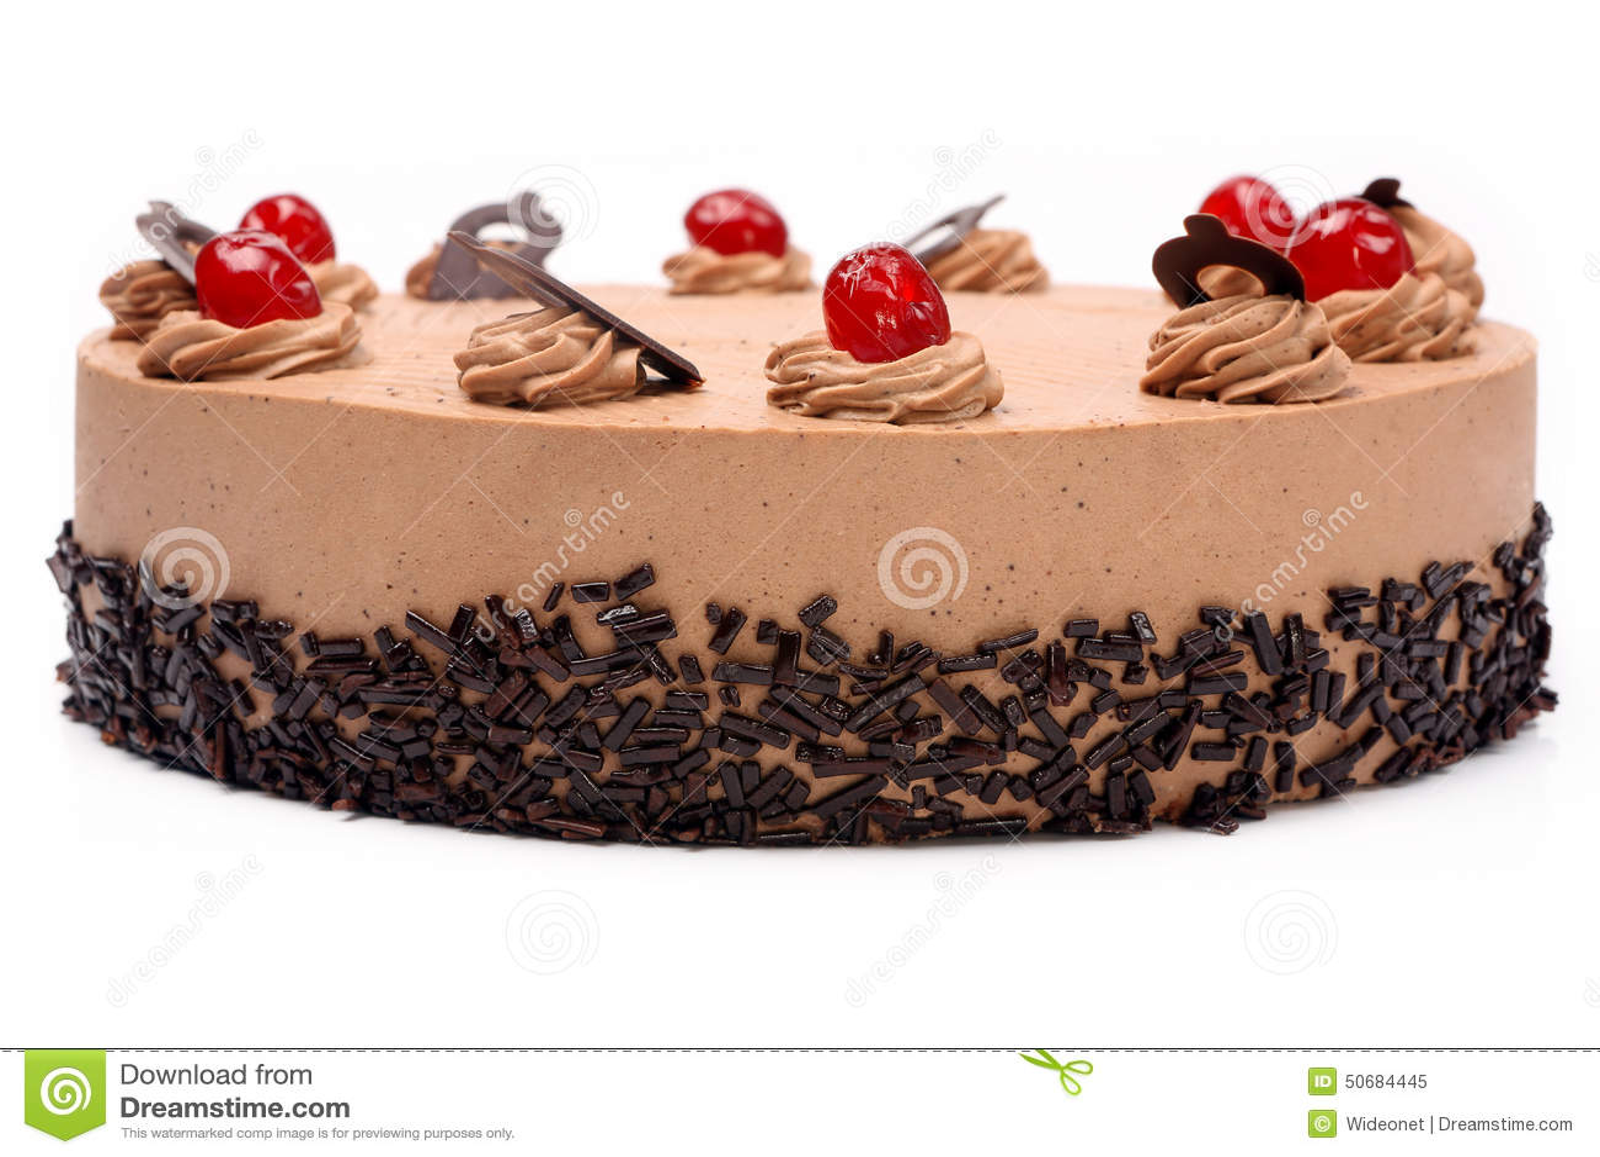 Download 奶油色可可粉蛋糕用在白色背景的樱桃 库存图片. 图片 包括有 可可粉, 生日, 点心, 制动手, 外壳, 活动 - 50684445